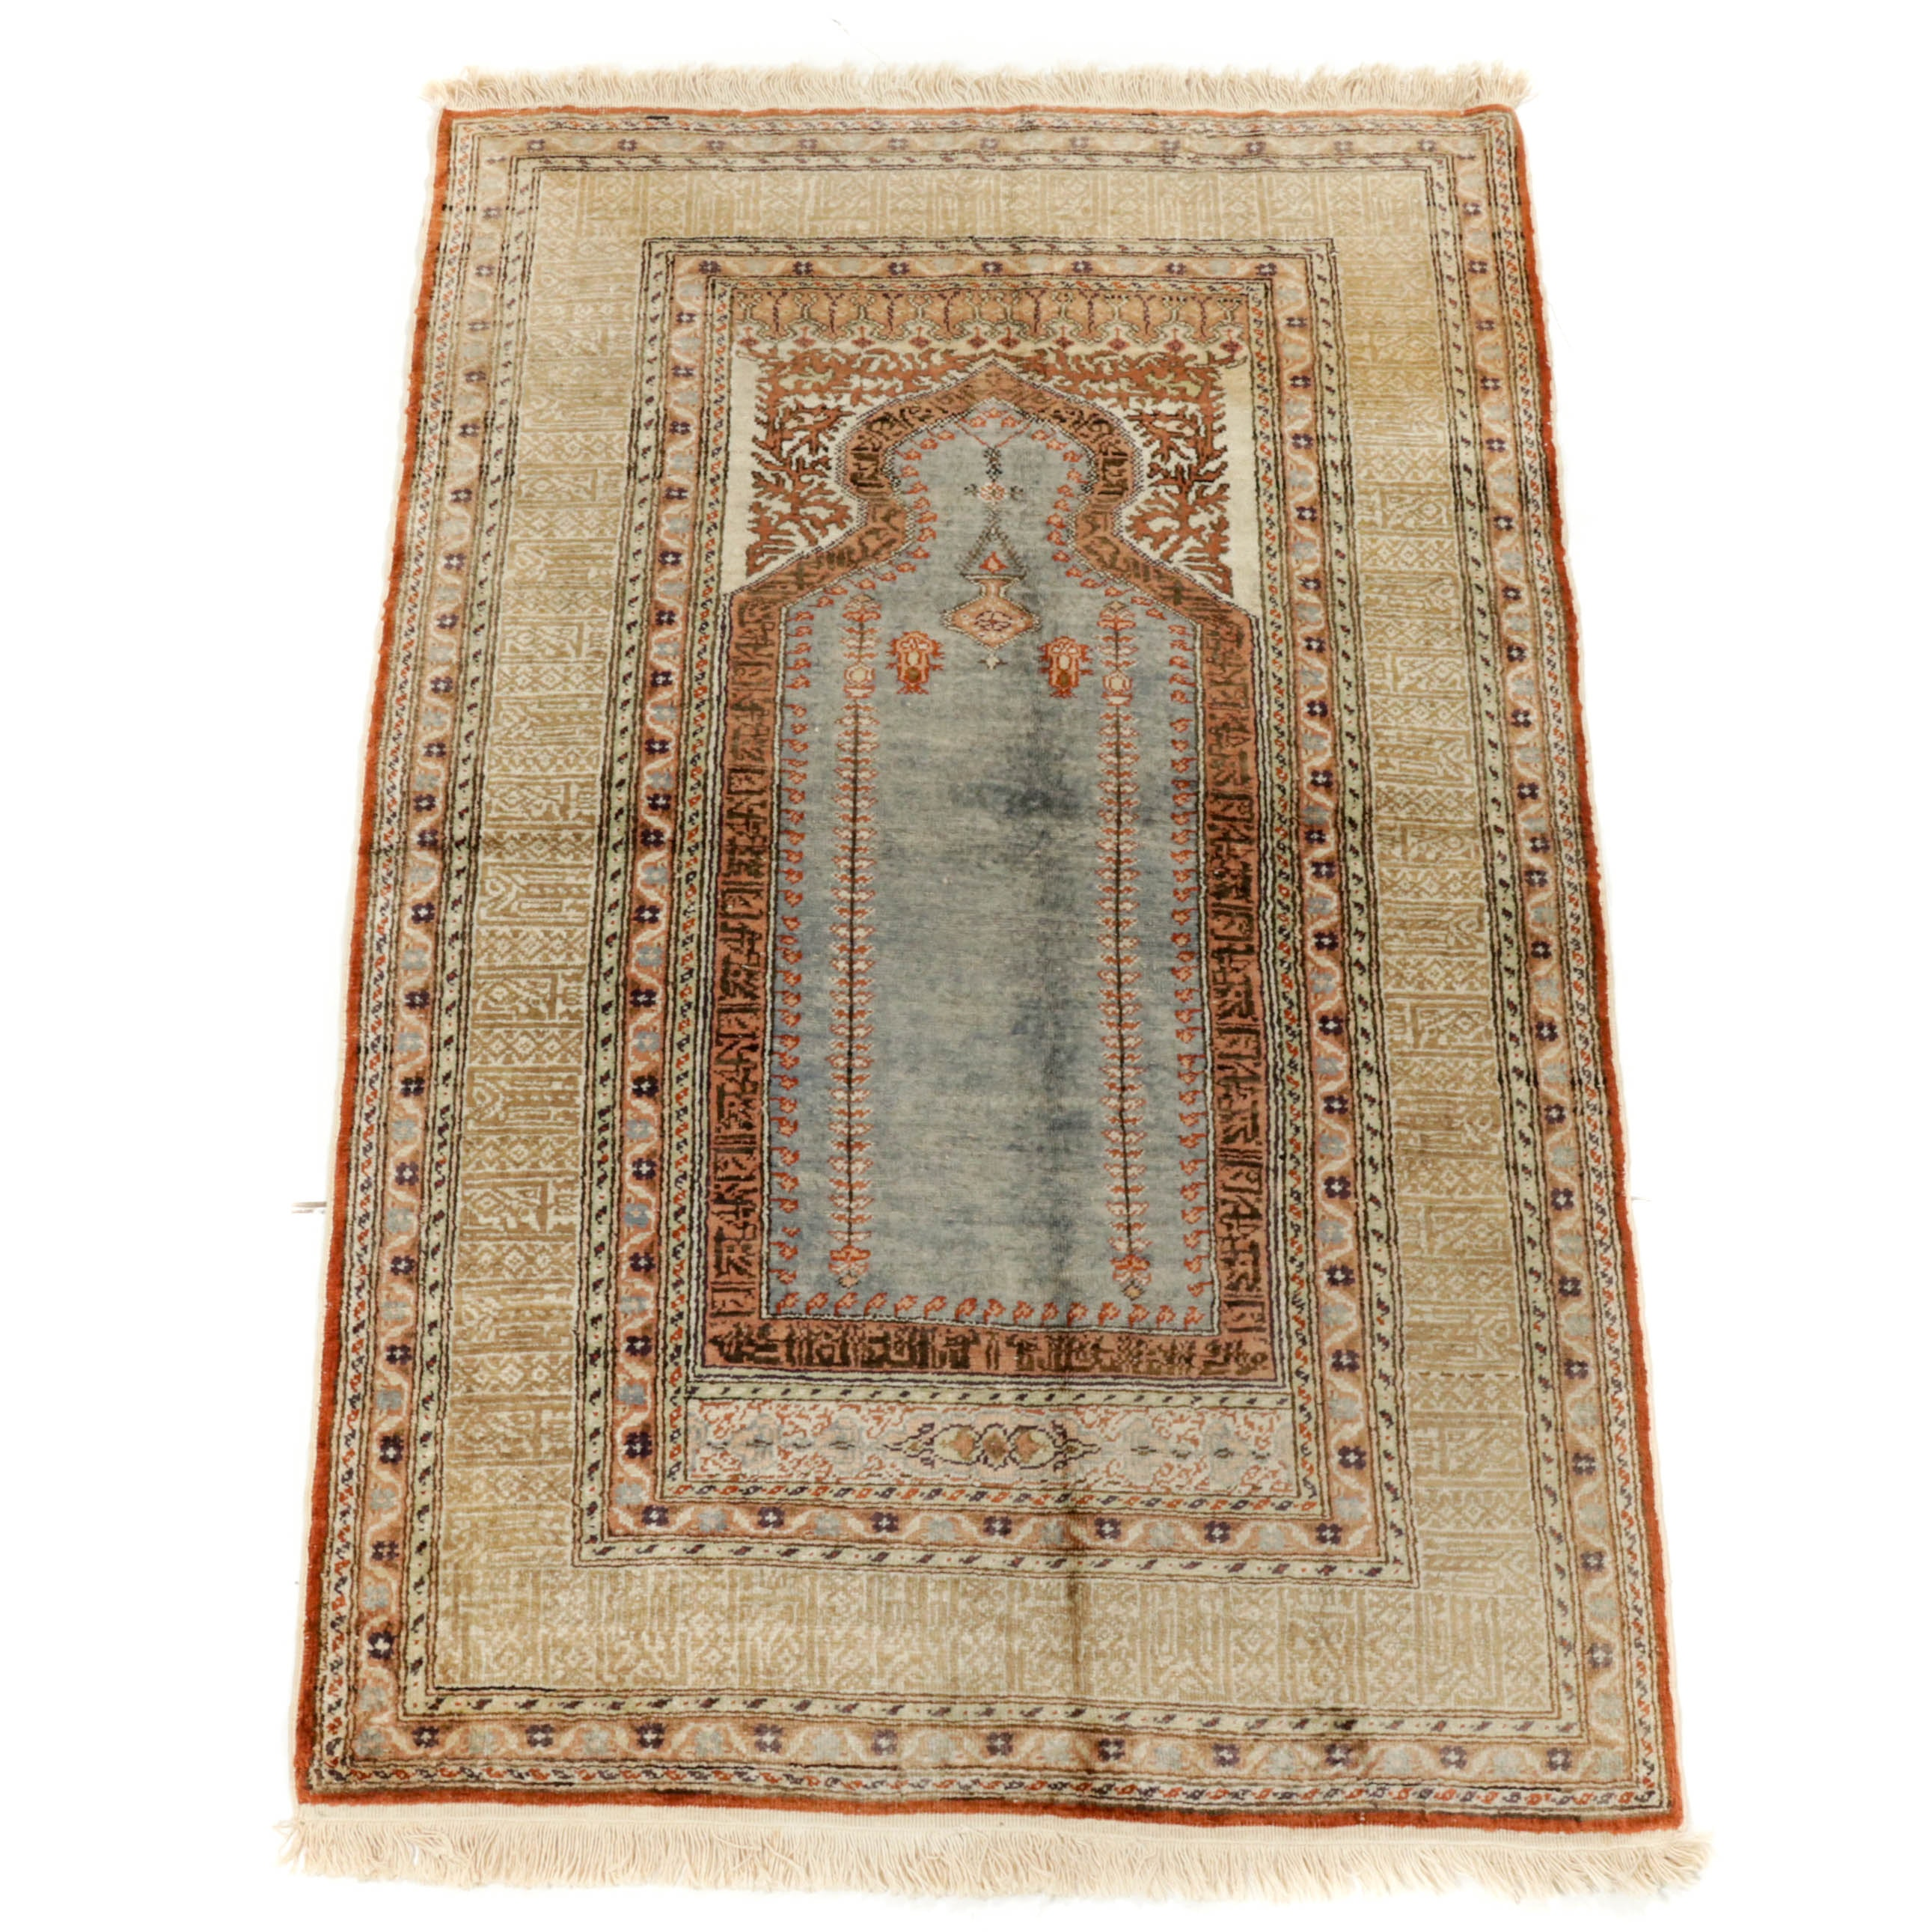 3.1' x 4.8' Hand-Knotted Turkish Kayseri Silk Prayer Rug